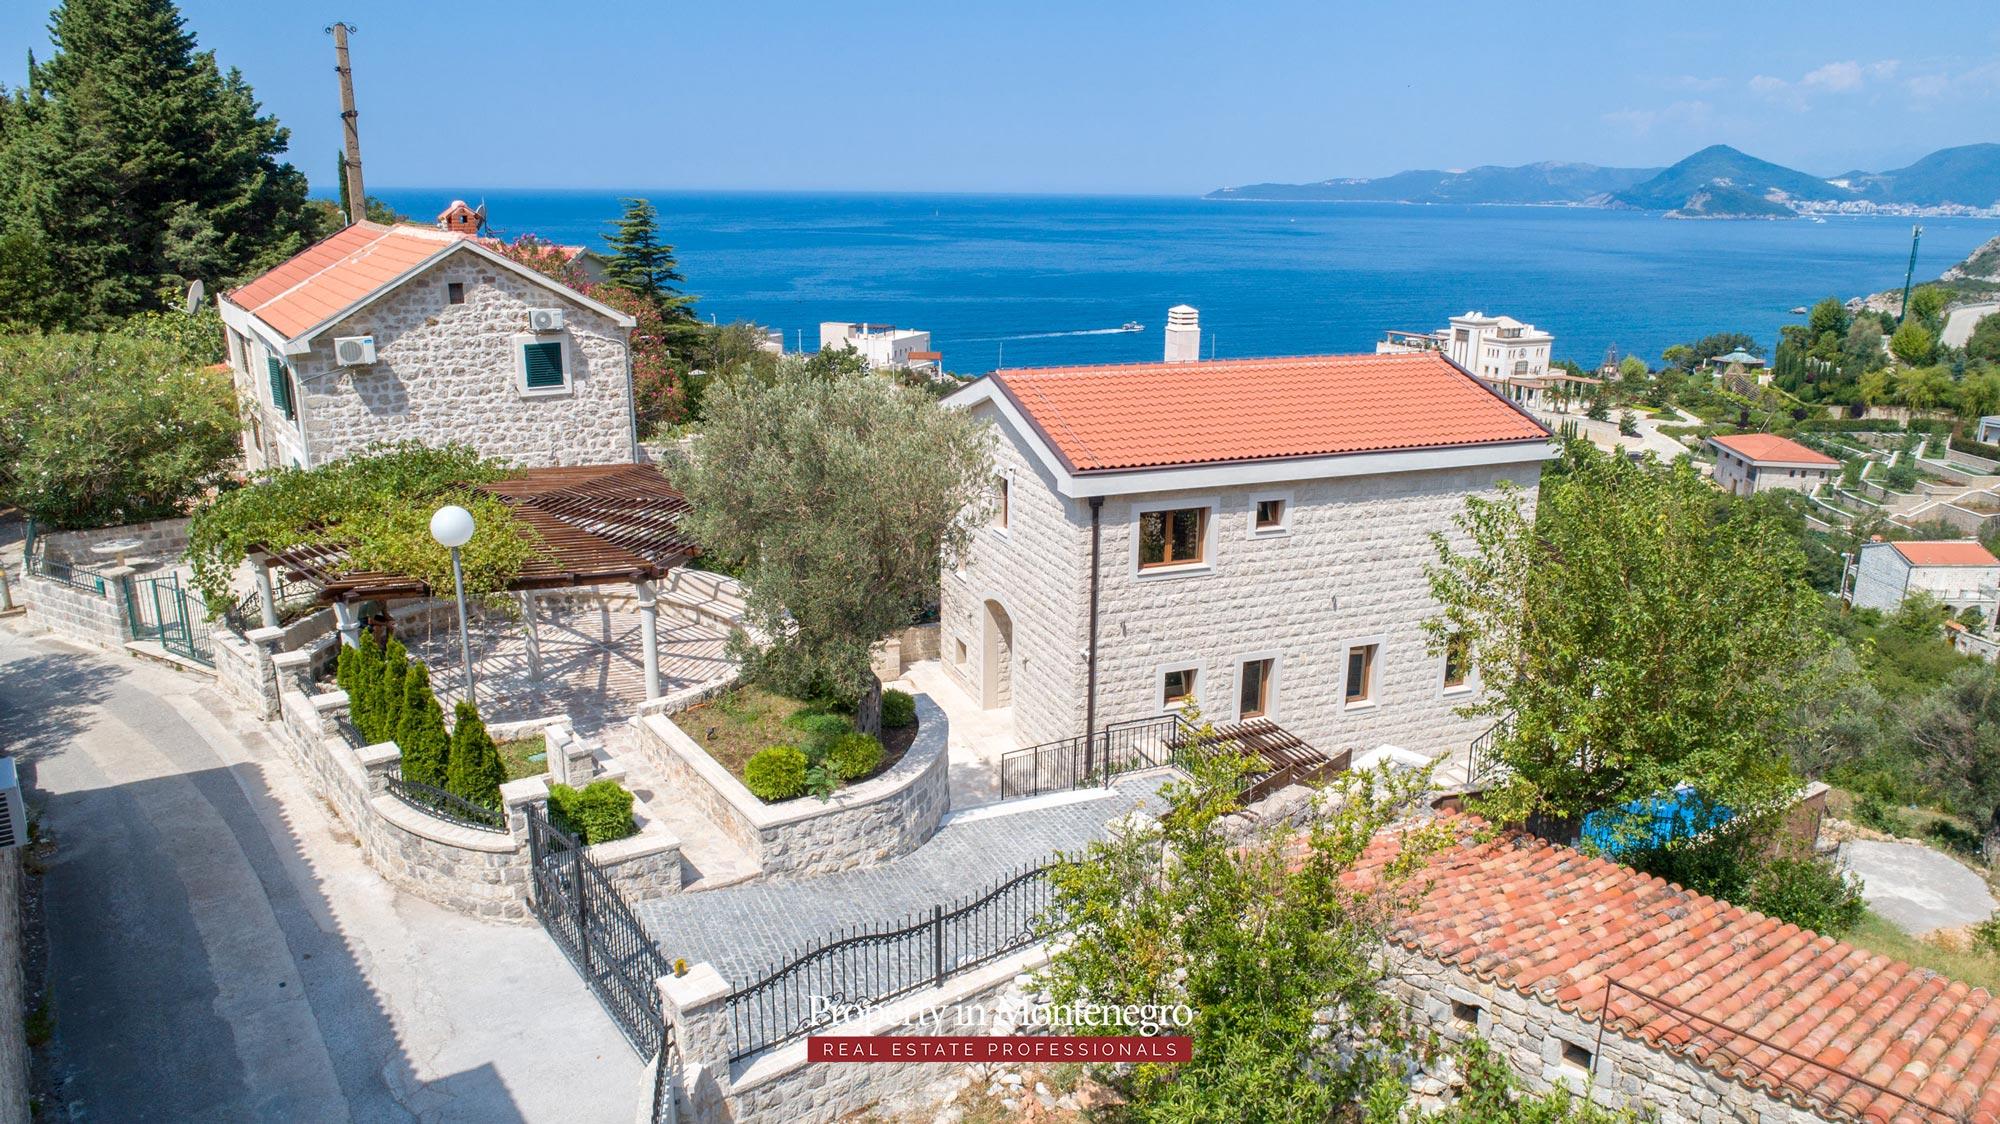 luxury-villa-with-swimming-pool-for-sale-in-Budva (27).jpg